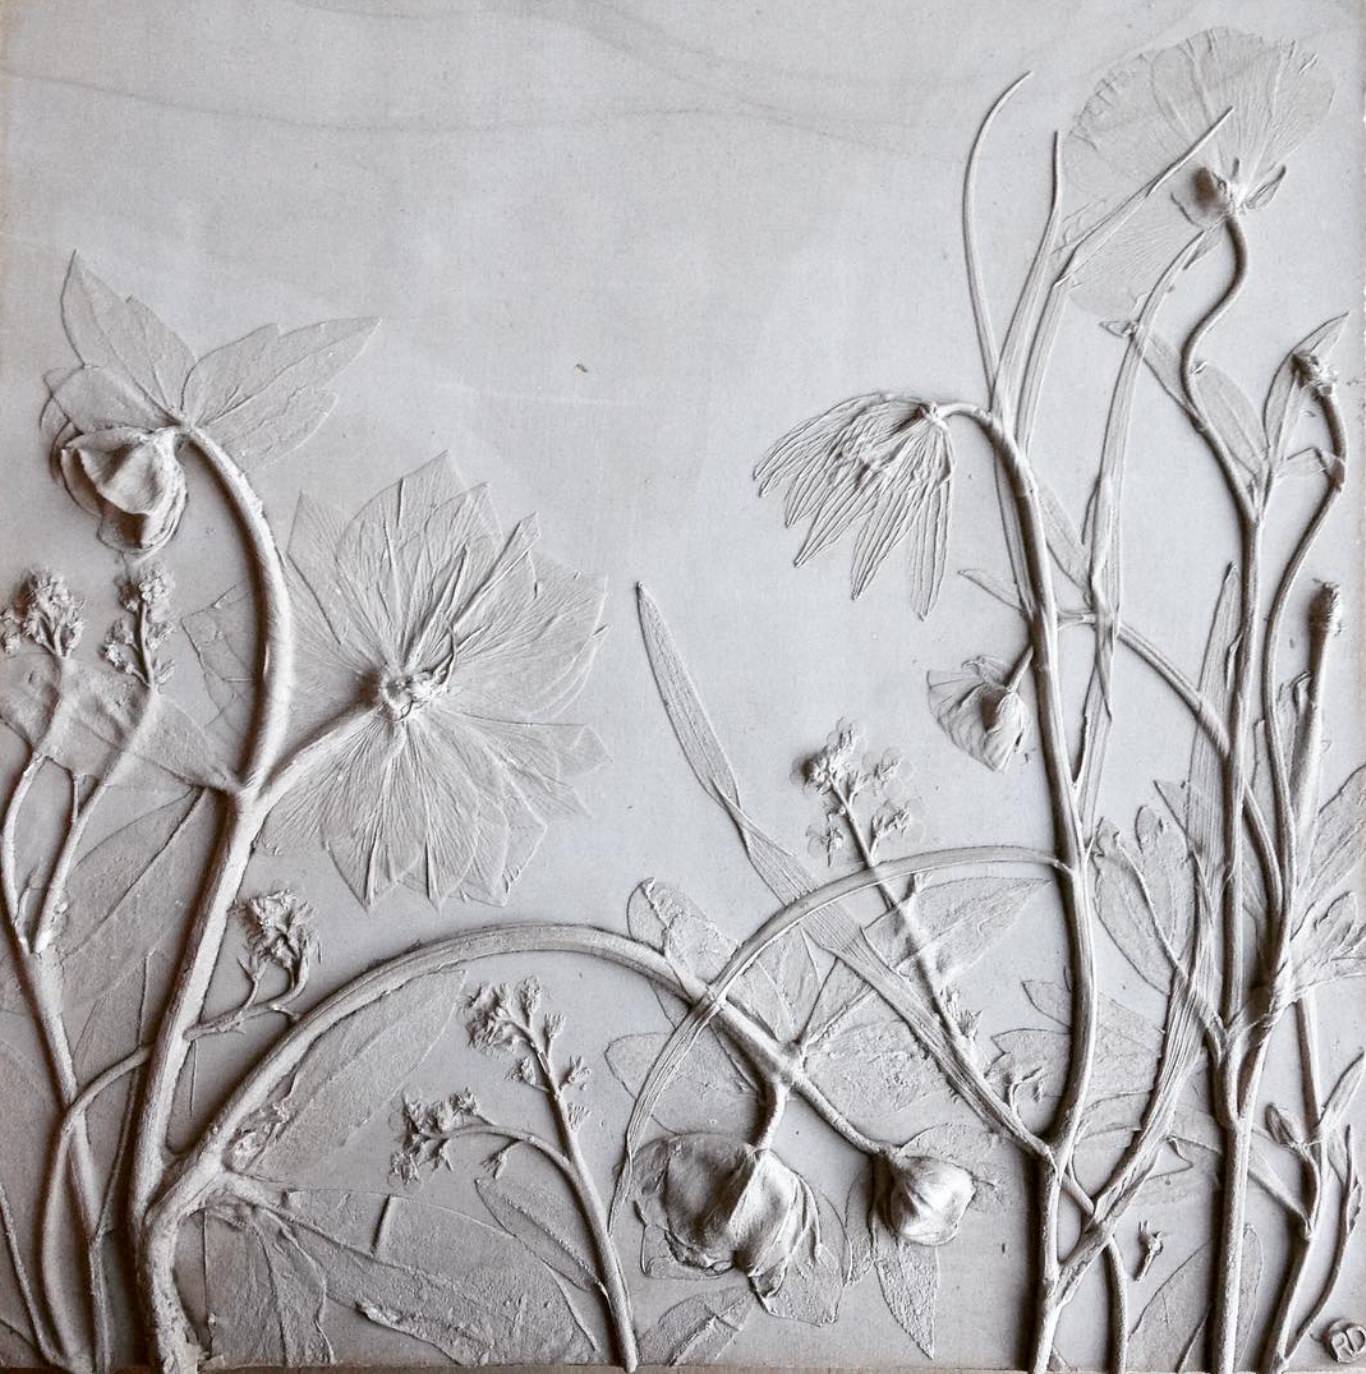 Plaster panel, photo courtesy of the artist.